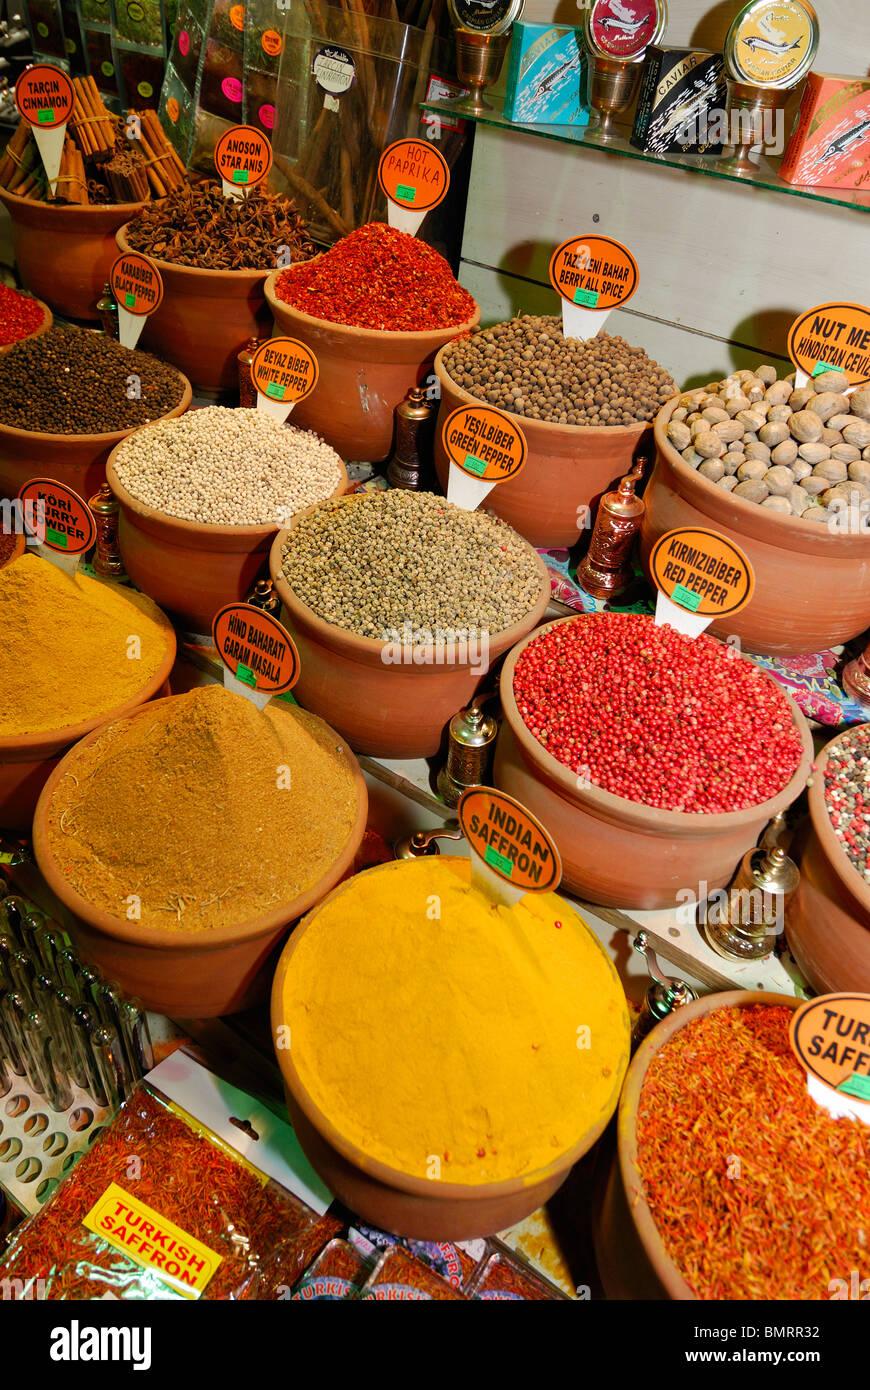 Istanbul. Turkey. Display of spices at the Spice Bazaar aka Egyptian Bazaar. - Stock Image